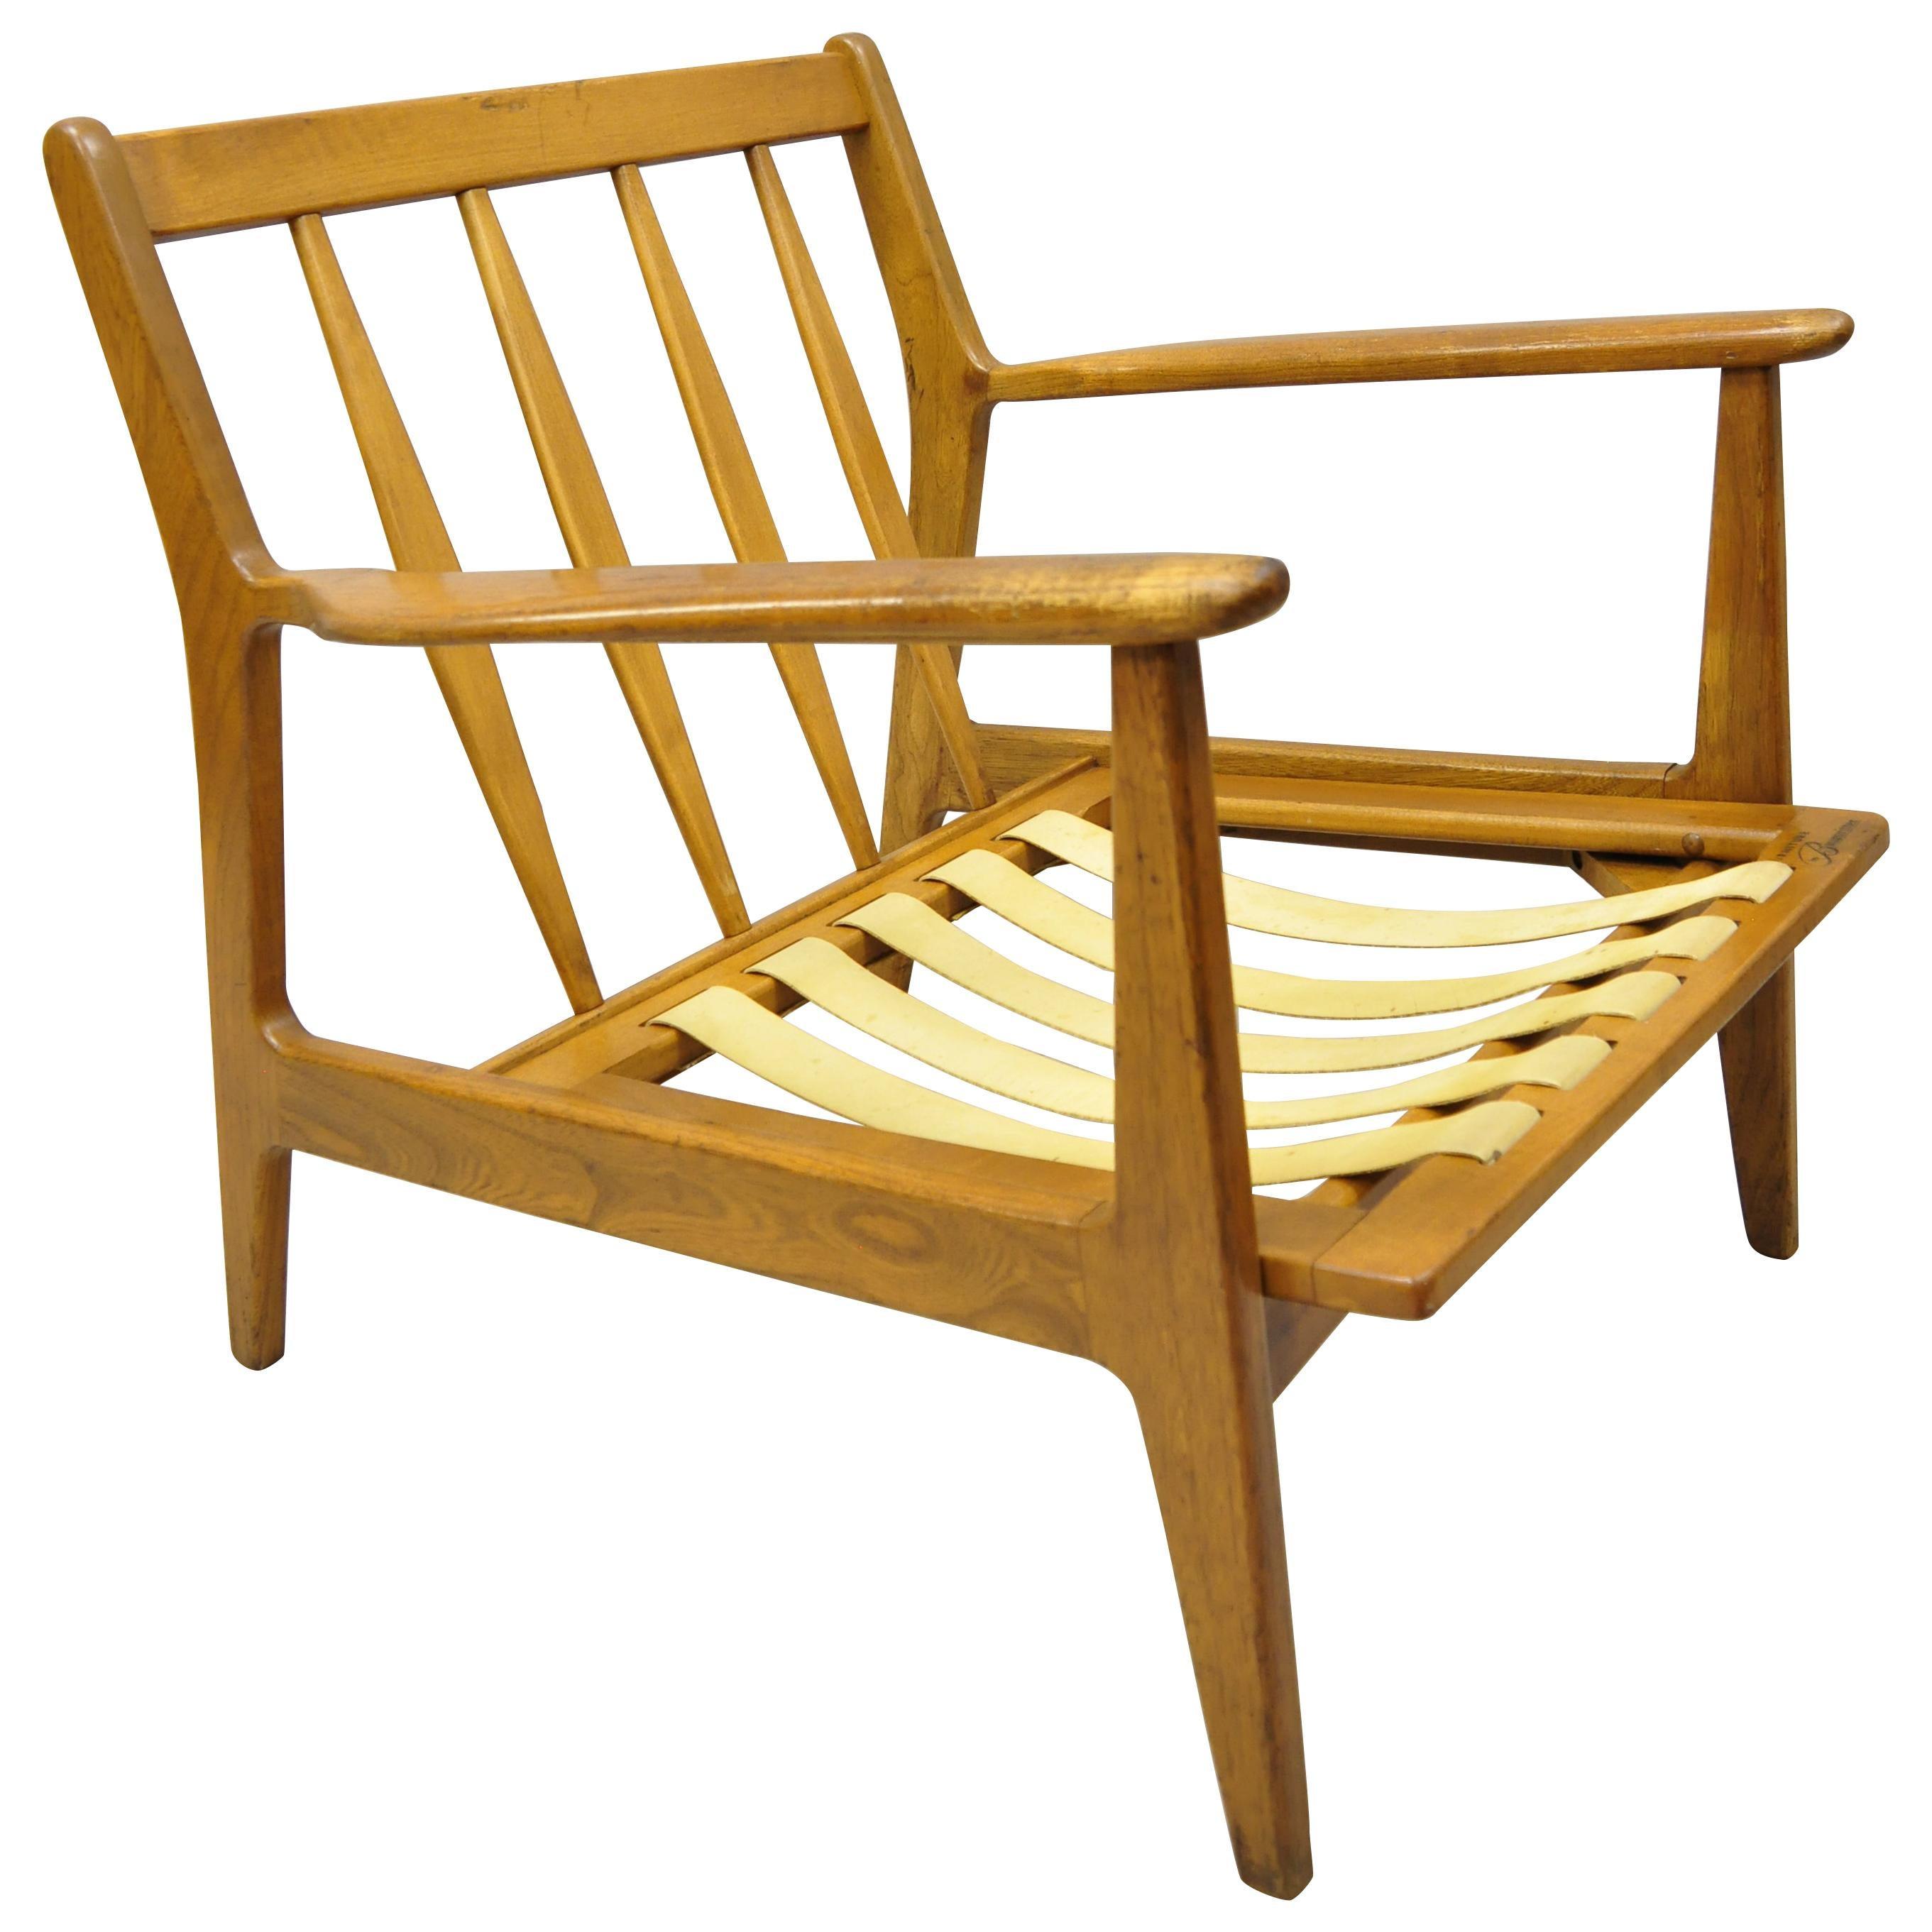 Mid-20th Century Modern Baumritter Walnut Lounge Danish Style Armchair